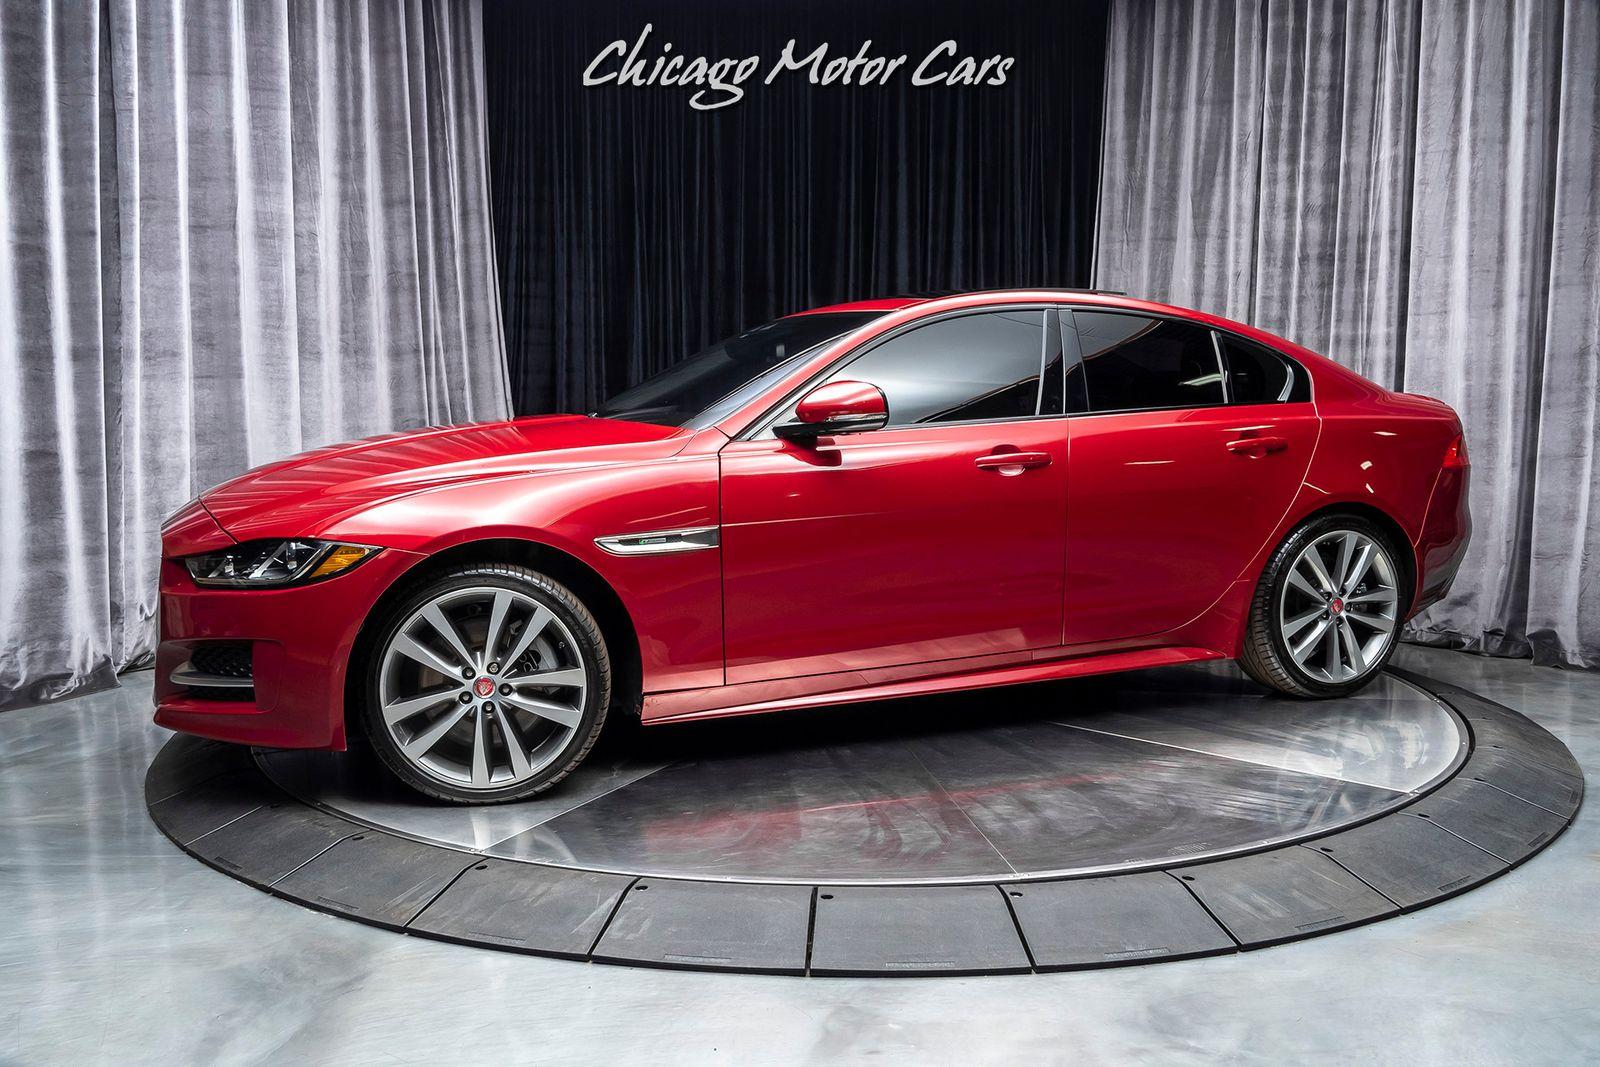 2017 Jaguar Xe . Lot 999186903615 Vin SAJAL4BV8HA948245